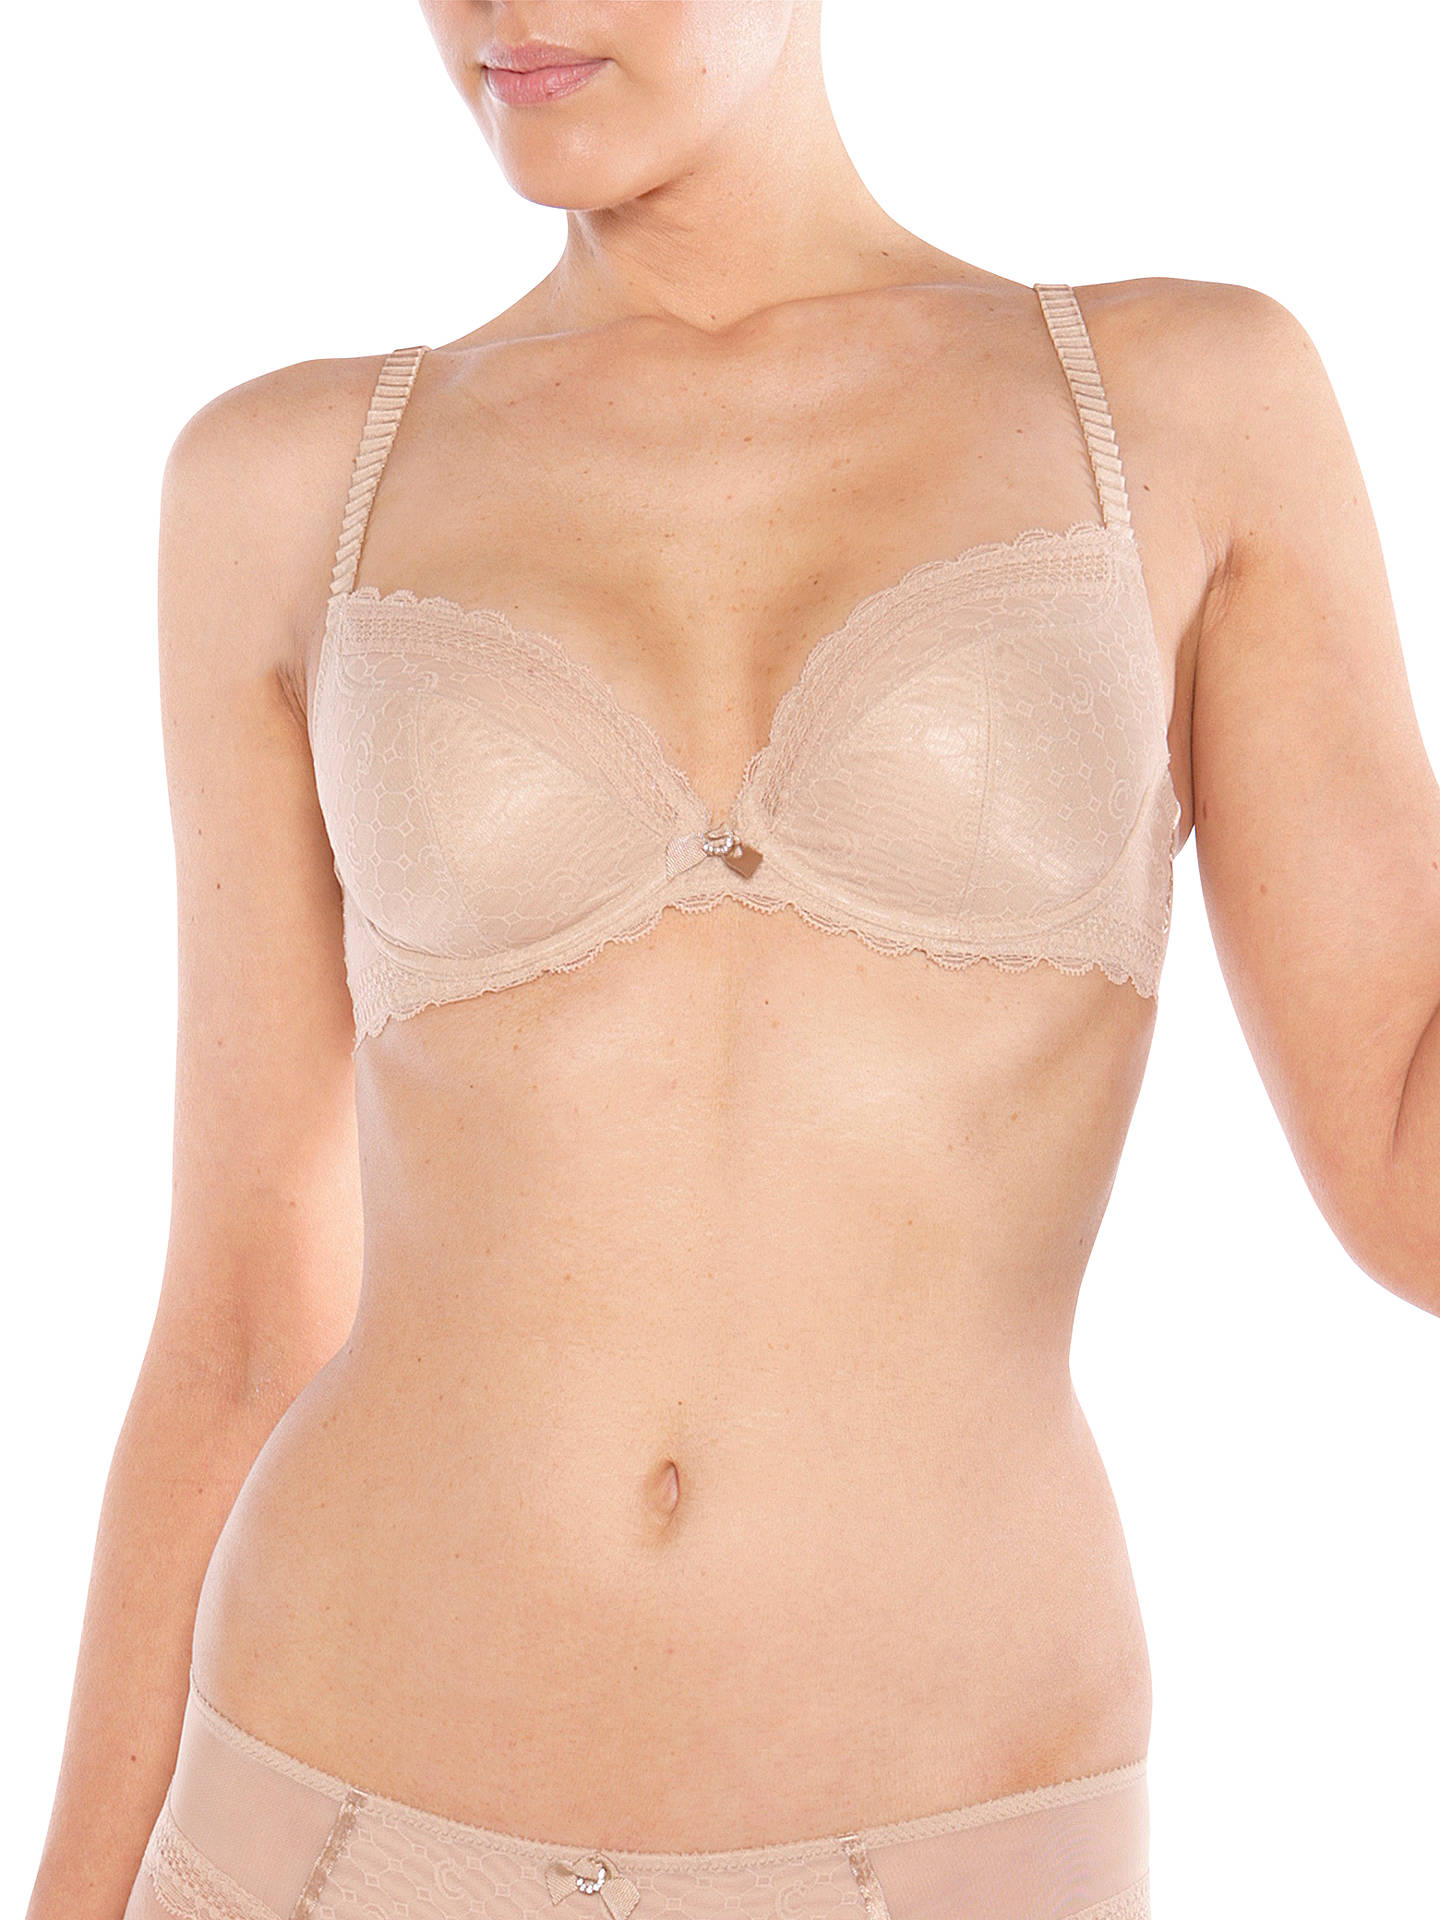 BuyChantelle C Chic Sexy Plunge Bra e29aae8f3